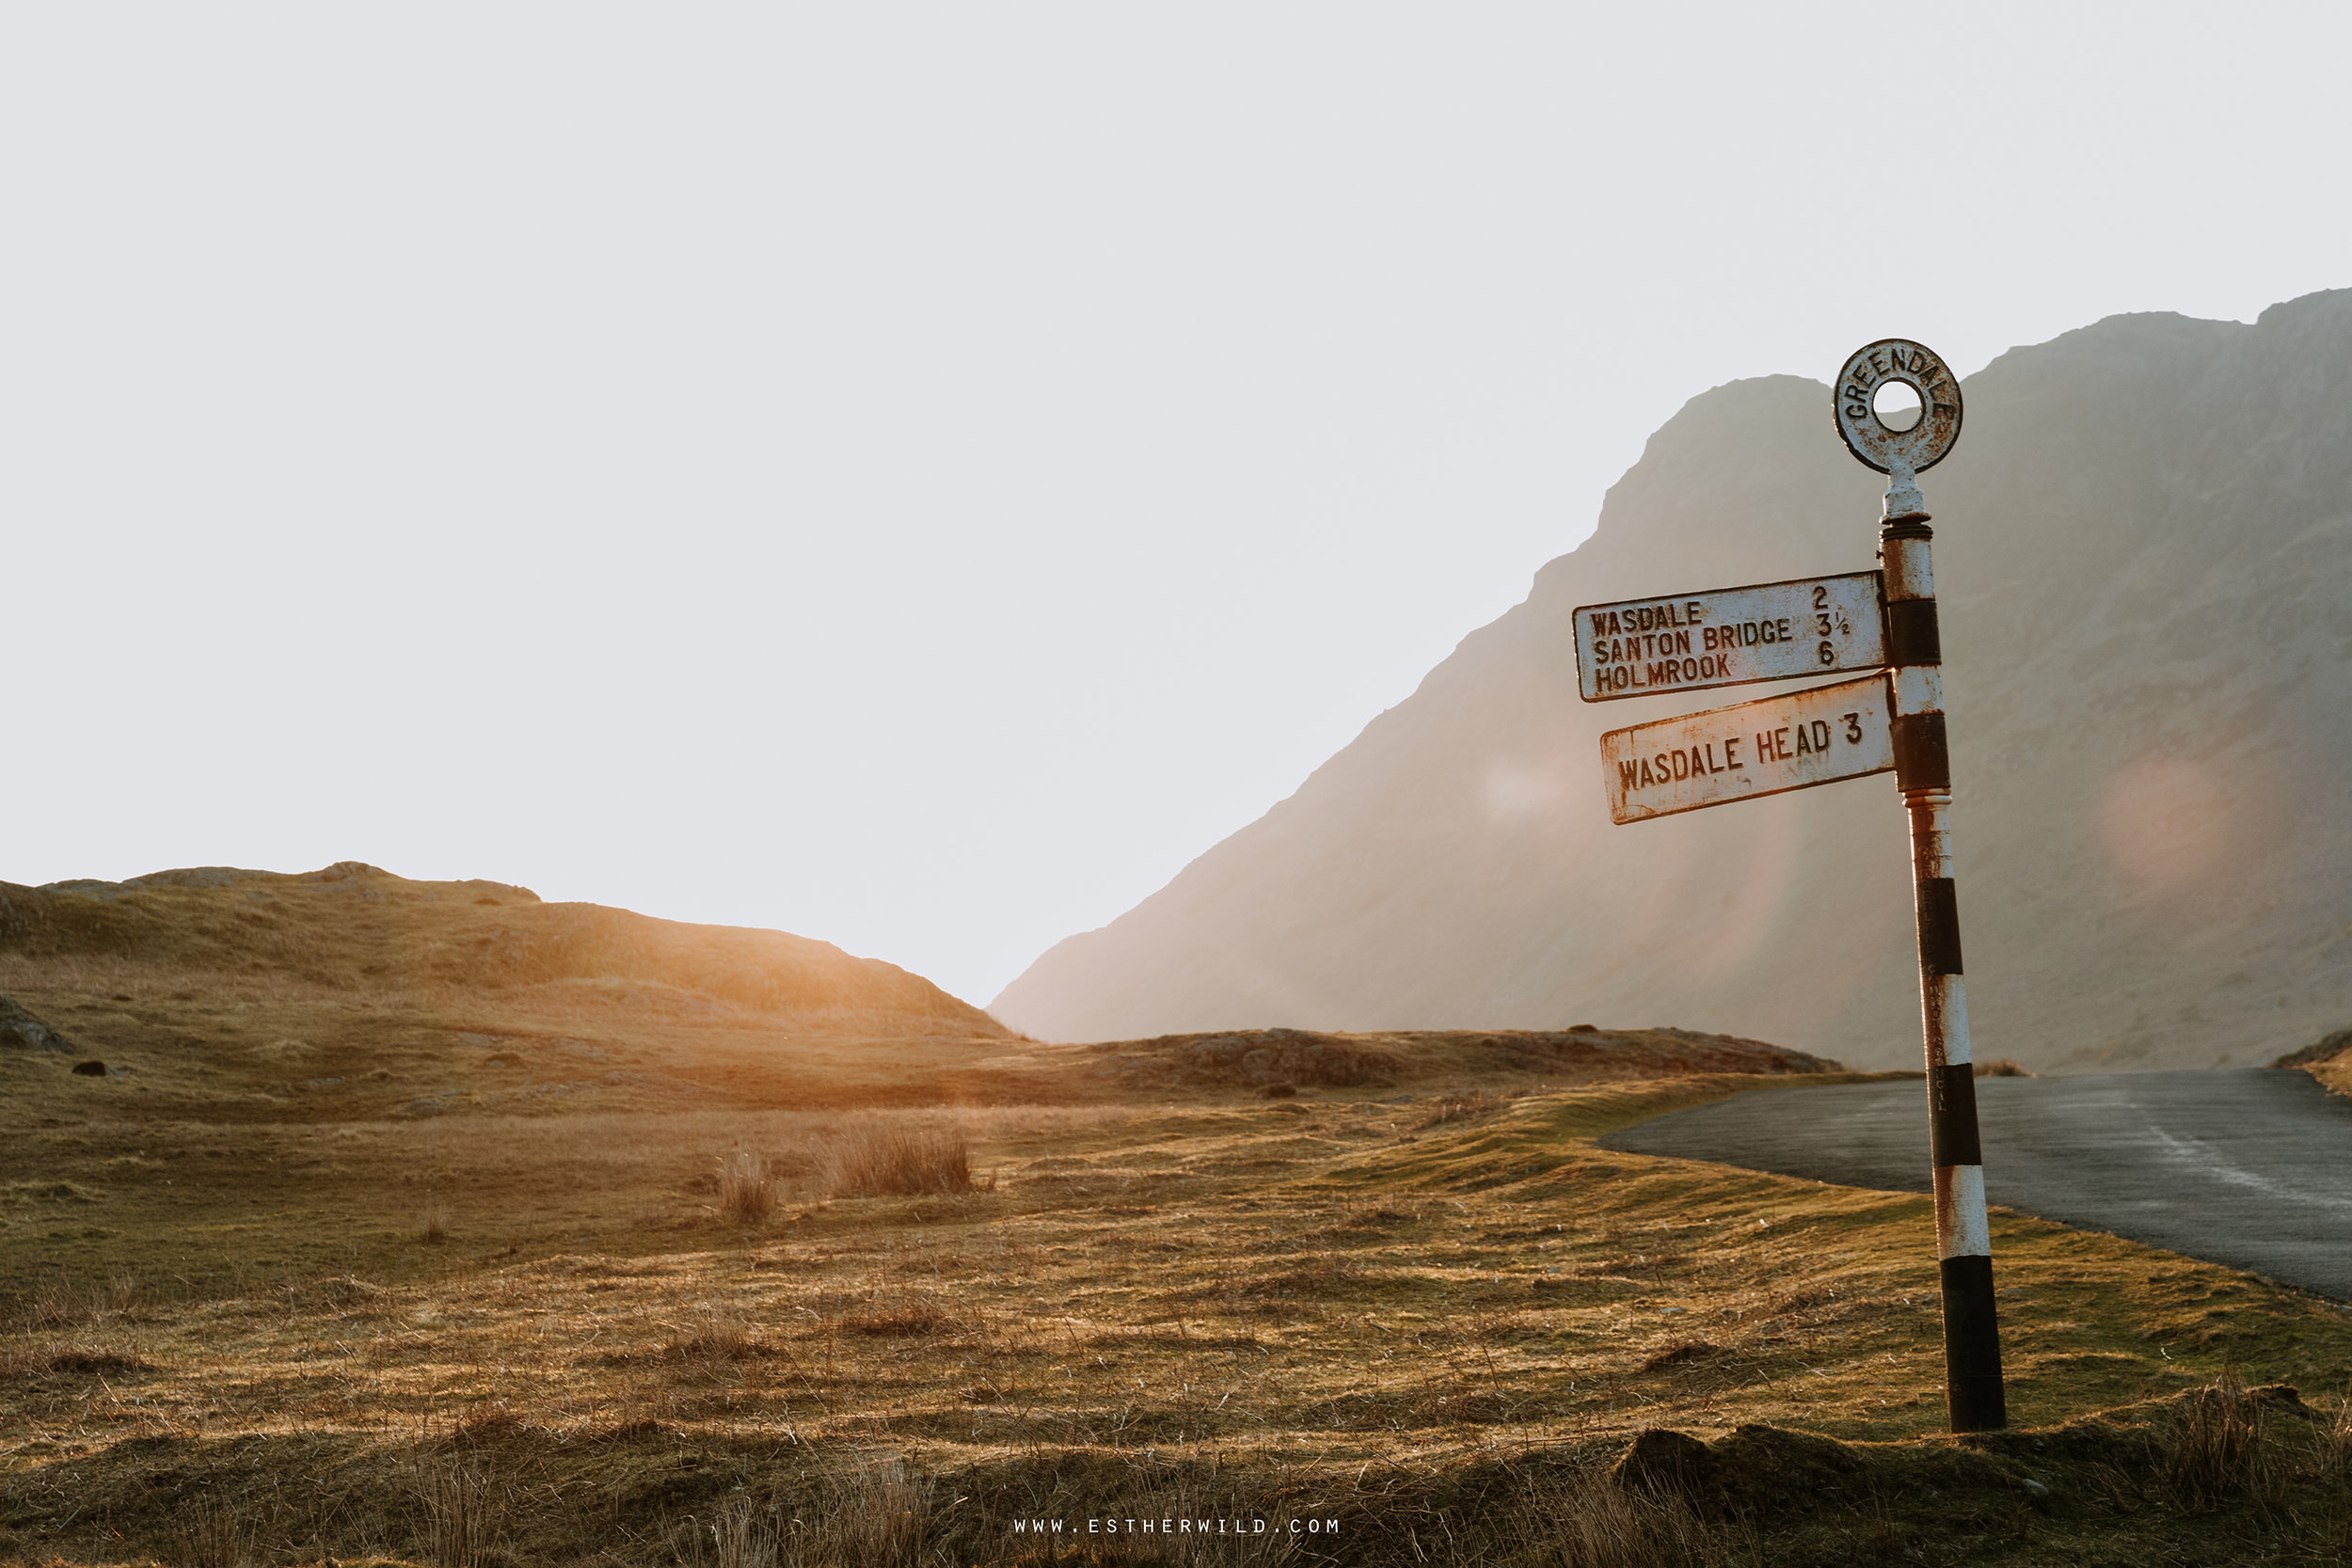 Cumbria_Lake_District_Wasdale_Wedding_Photographer_Destination_Engagement_Anniversary_Esther_Wild_IMG_4788.jpg